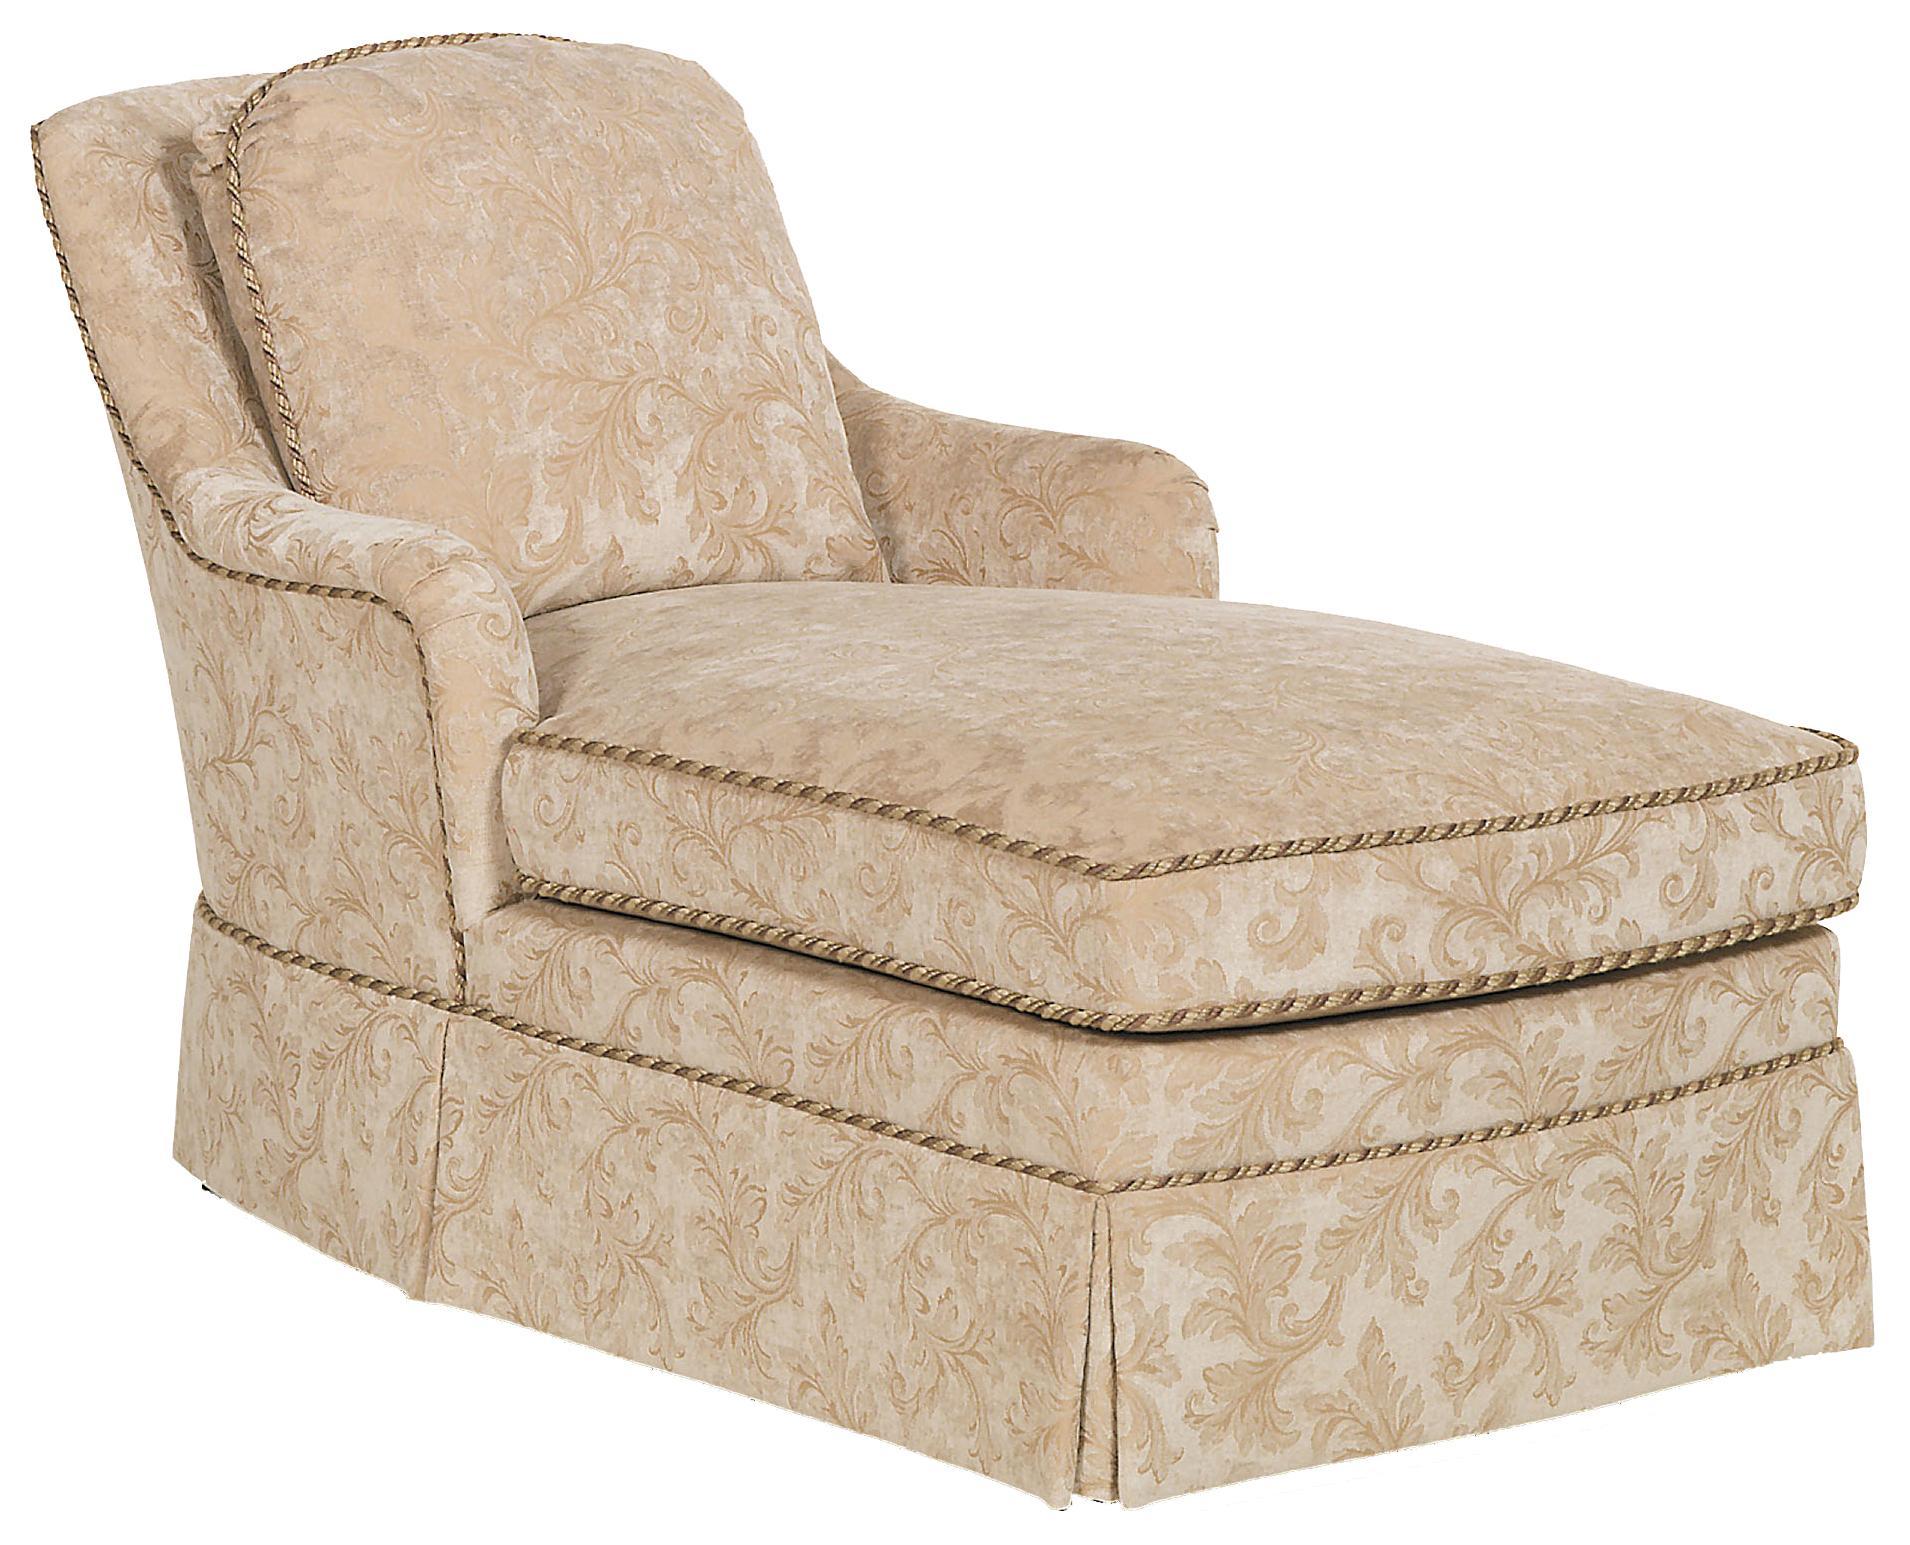 Fairfield Sofa AccentsTraditional Chaise